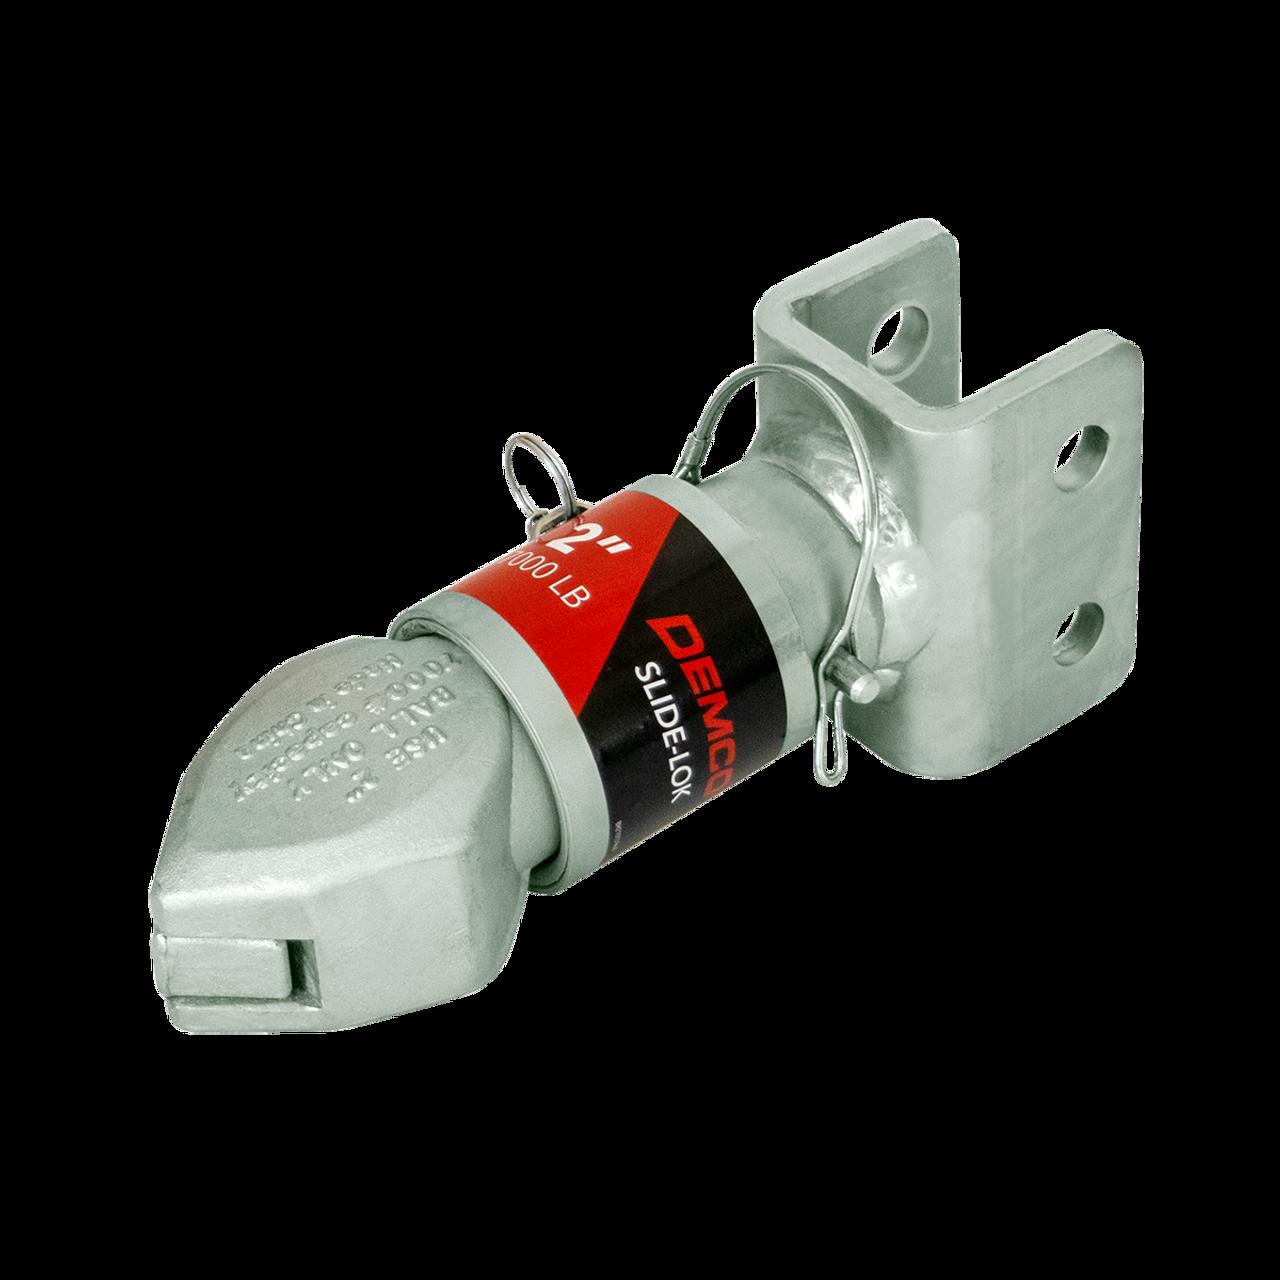 "05823-95 --- Demco Slide-Lock Adjustable 2"" Coupler - 7,000 lbs Capacity"